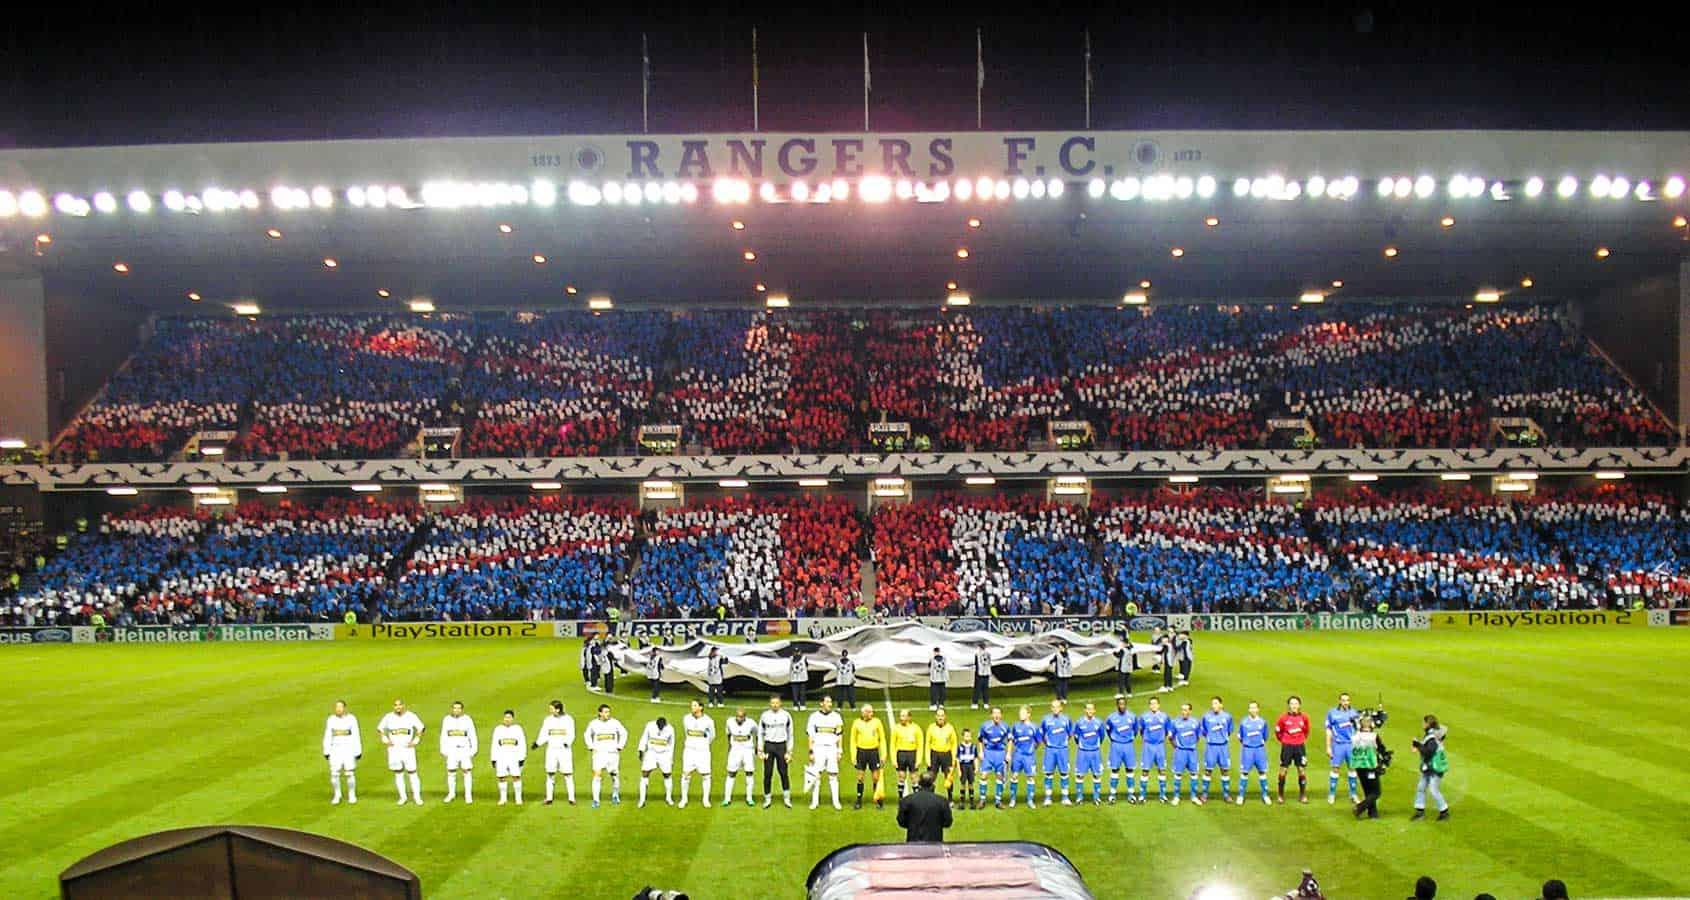 Fotbollsresor, Glasgow Rangers Biljetter, Scottish Premiership, Skottland, Ibrox Stadium